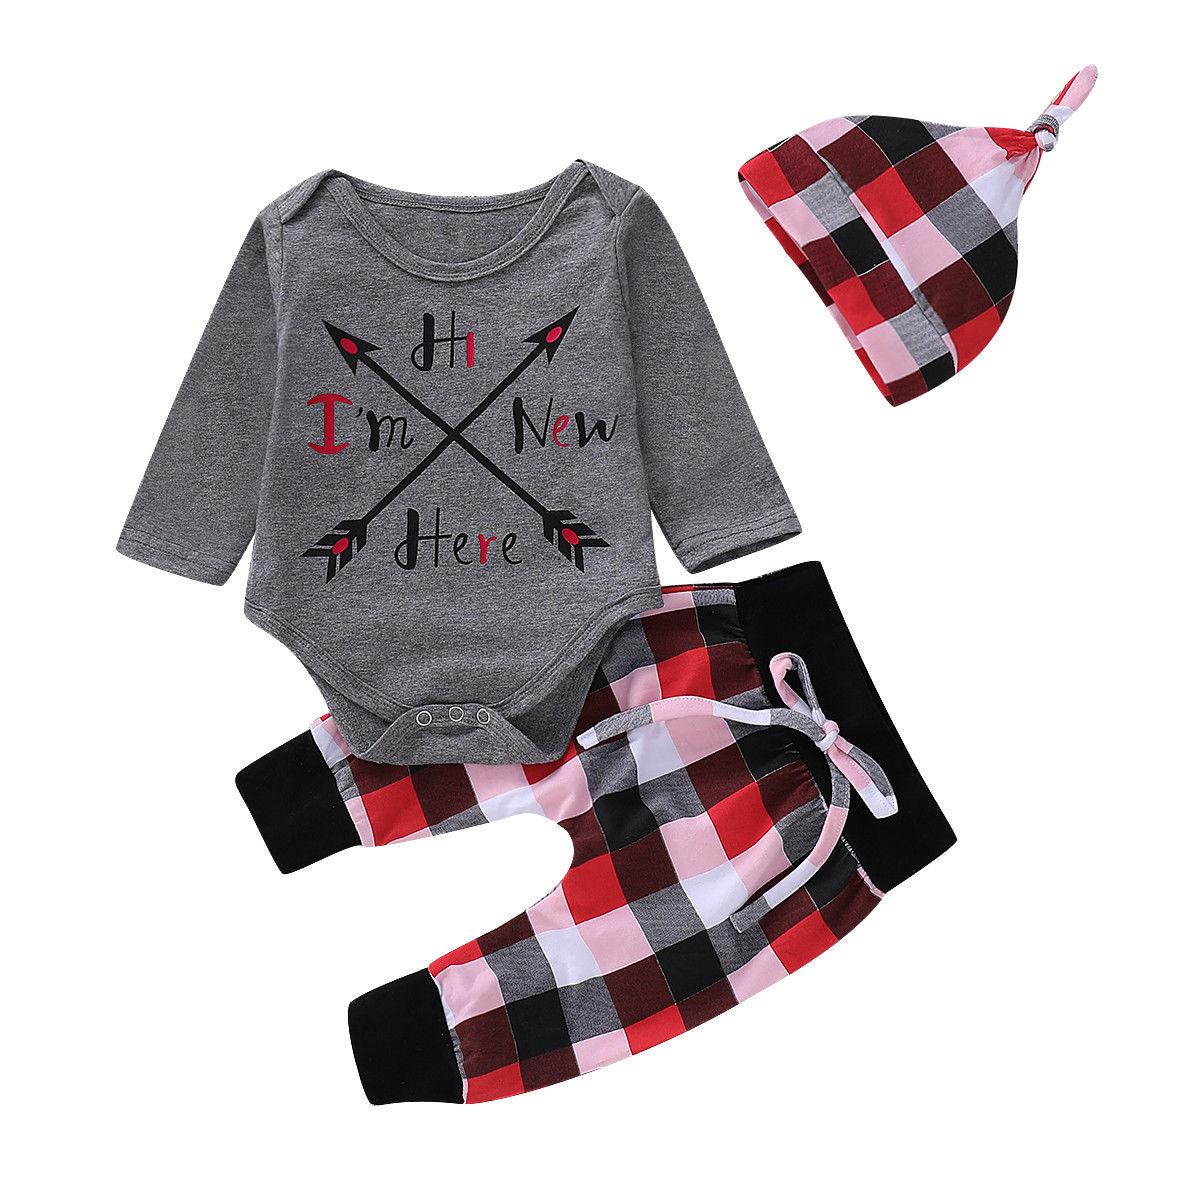 0-18M Newborn Baby Boy Girl Long Sleeve Arrow Cotton Bodysuit Tops Plaid Pant Trouser Hat 3PCS Outfits Clothing Set